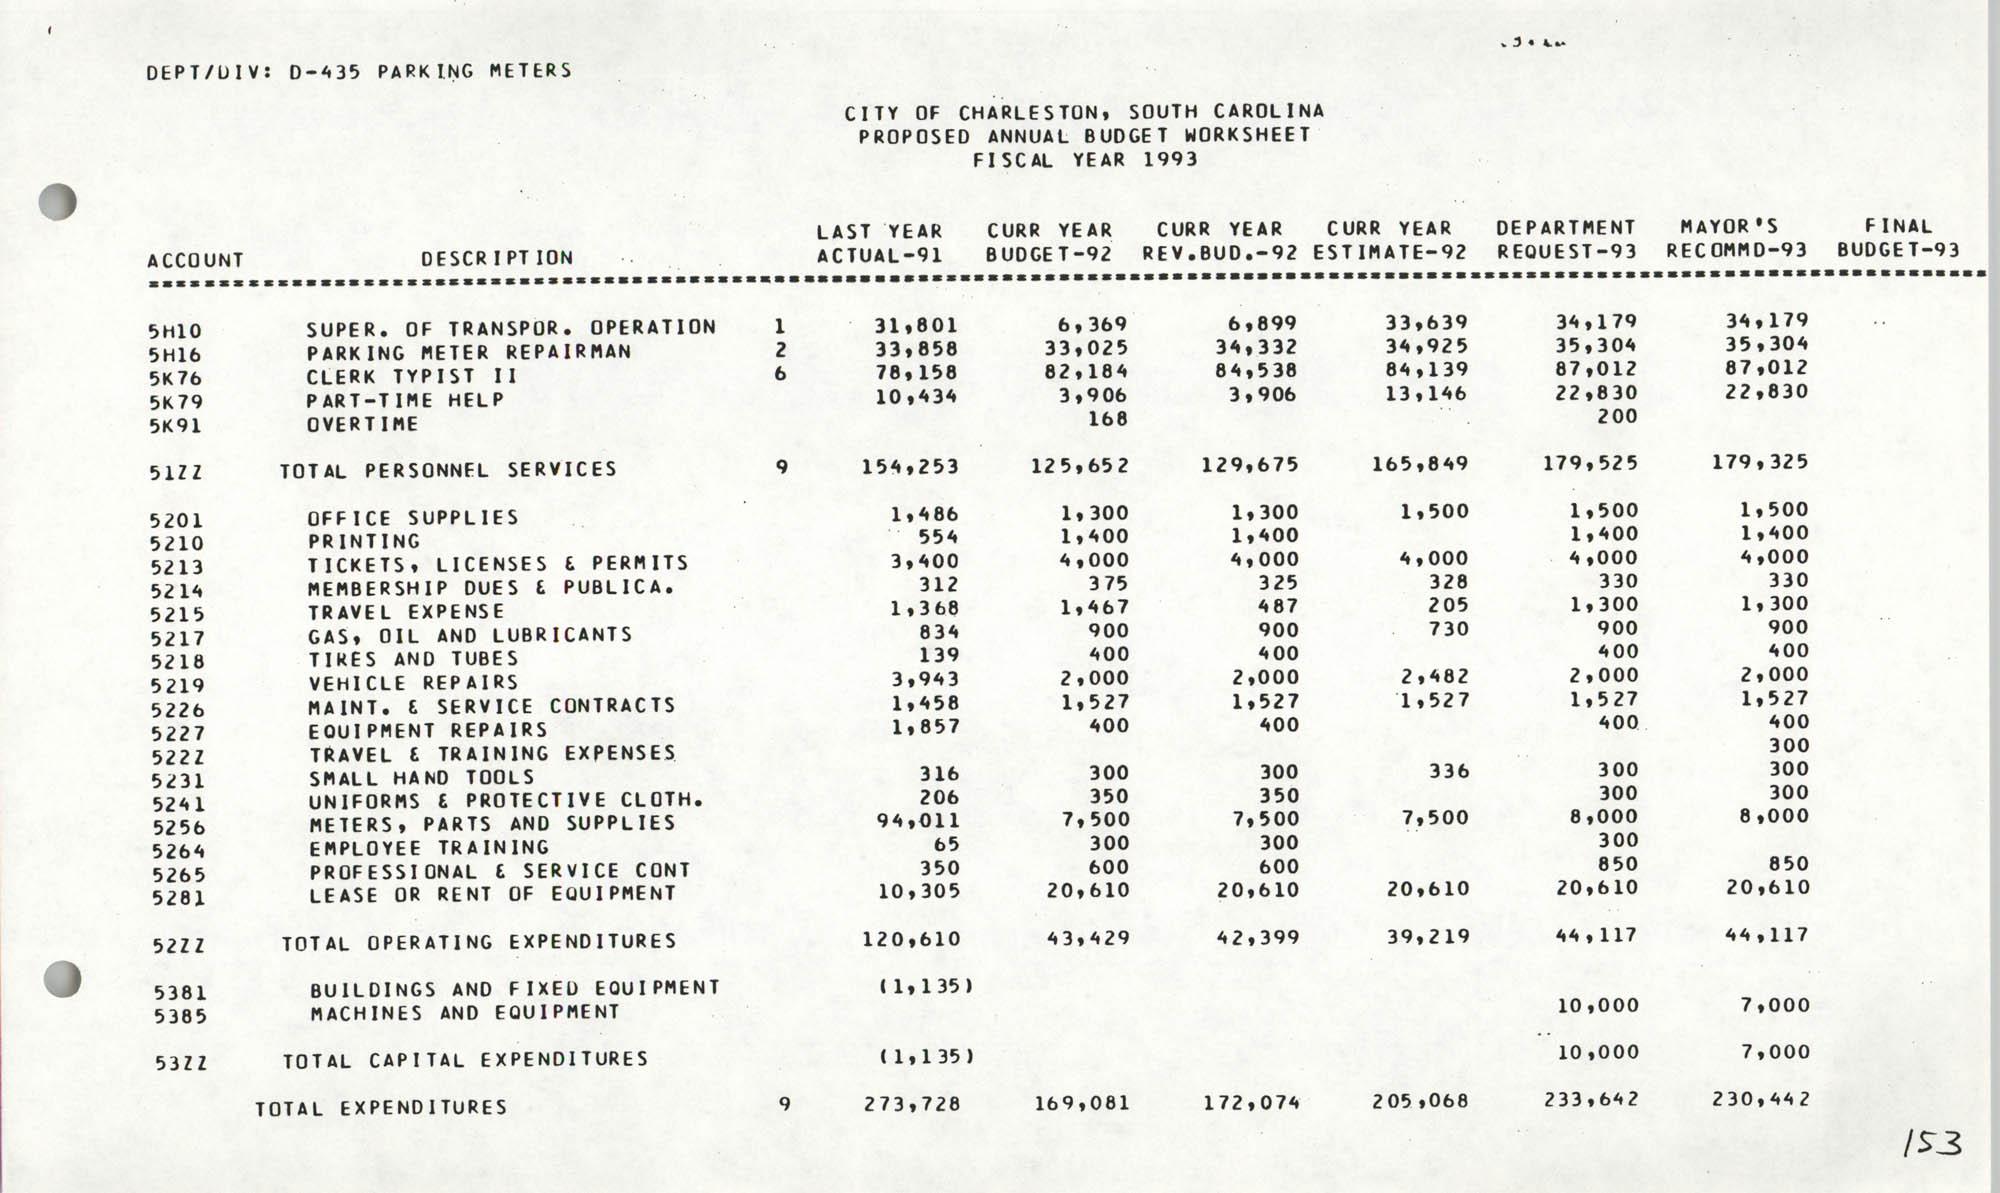 The City Council of Charleston, South Carolina, 1993 Budget, Page 153